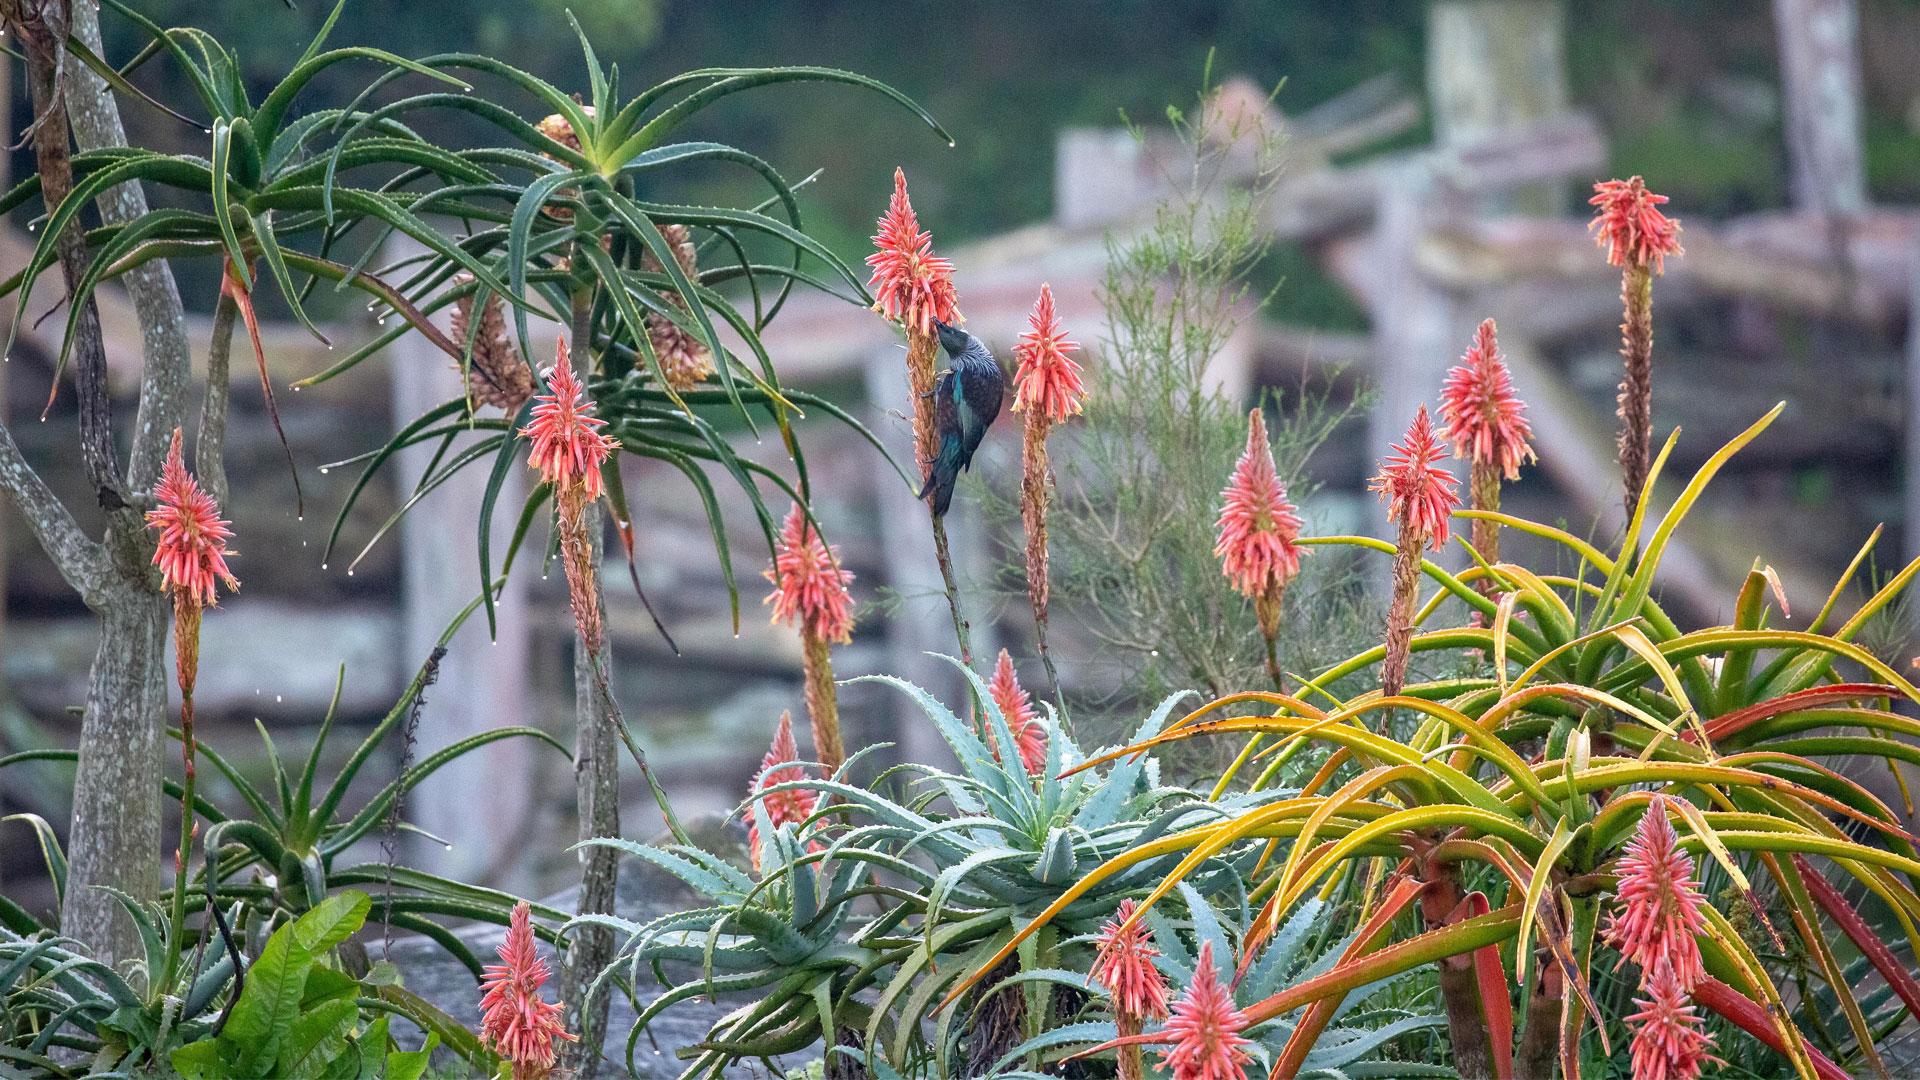 https://rfacdn.nz/zoo/assets/media/horticulture-blog-aloe-gallery-9.jpg